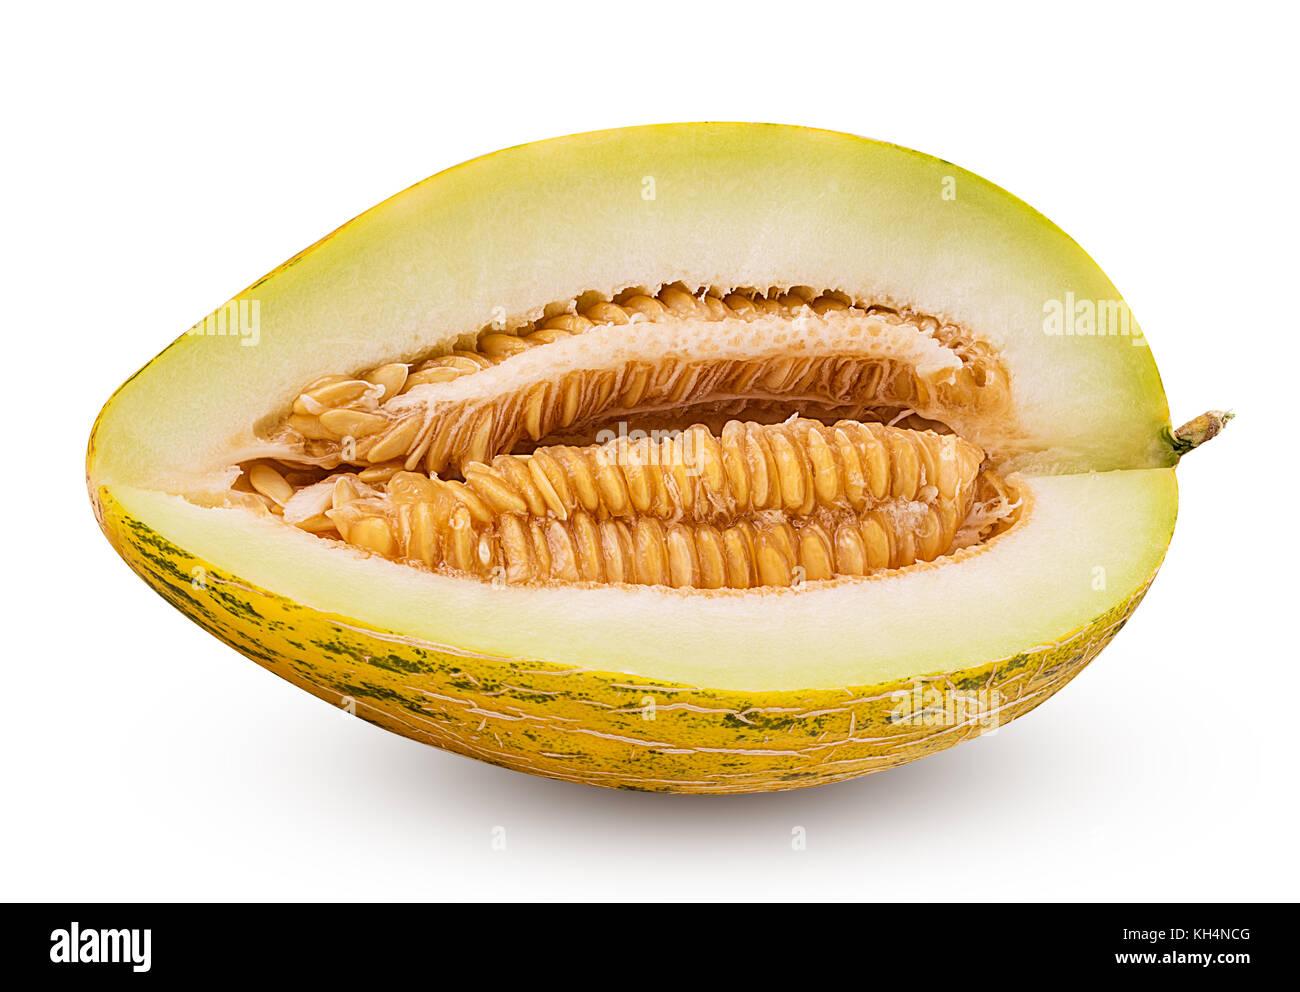 how to ripen cut melon